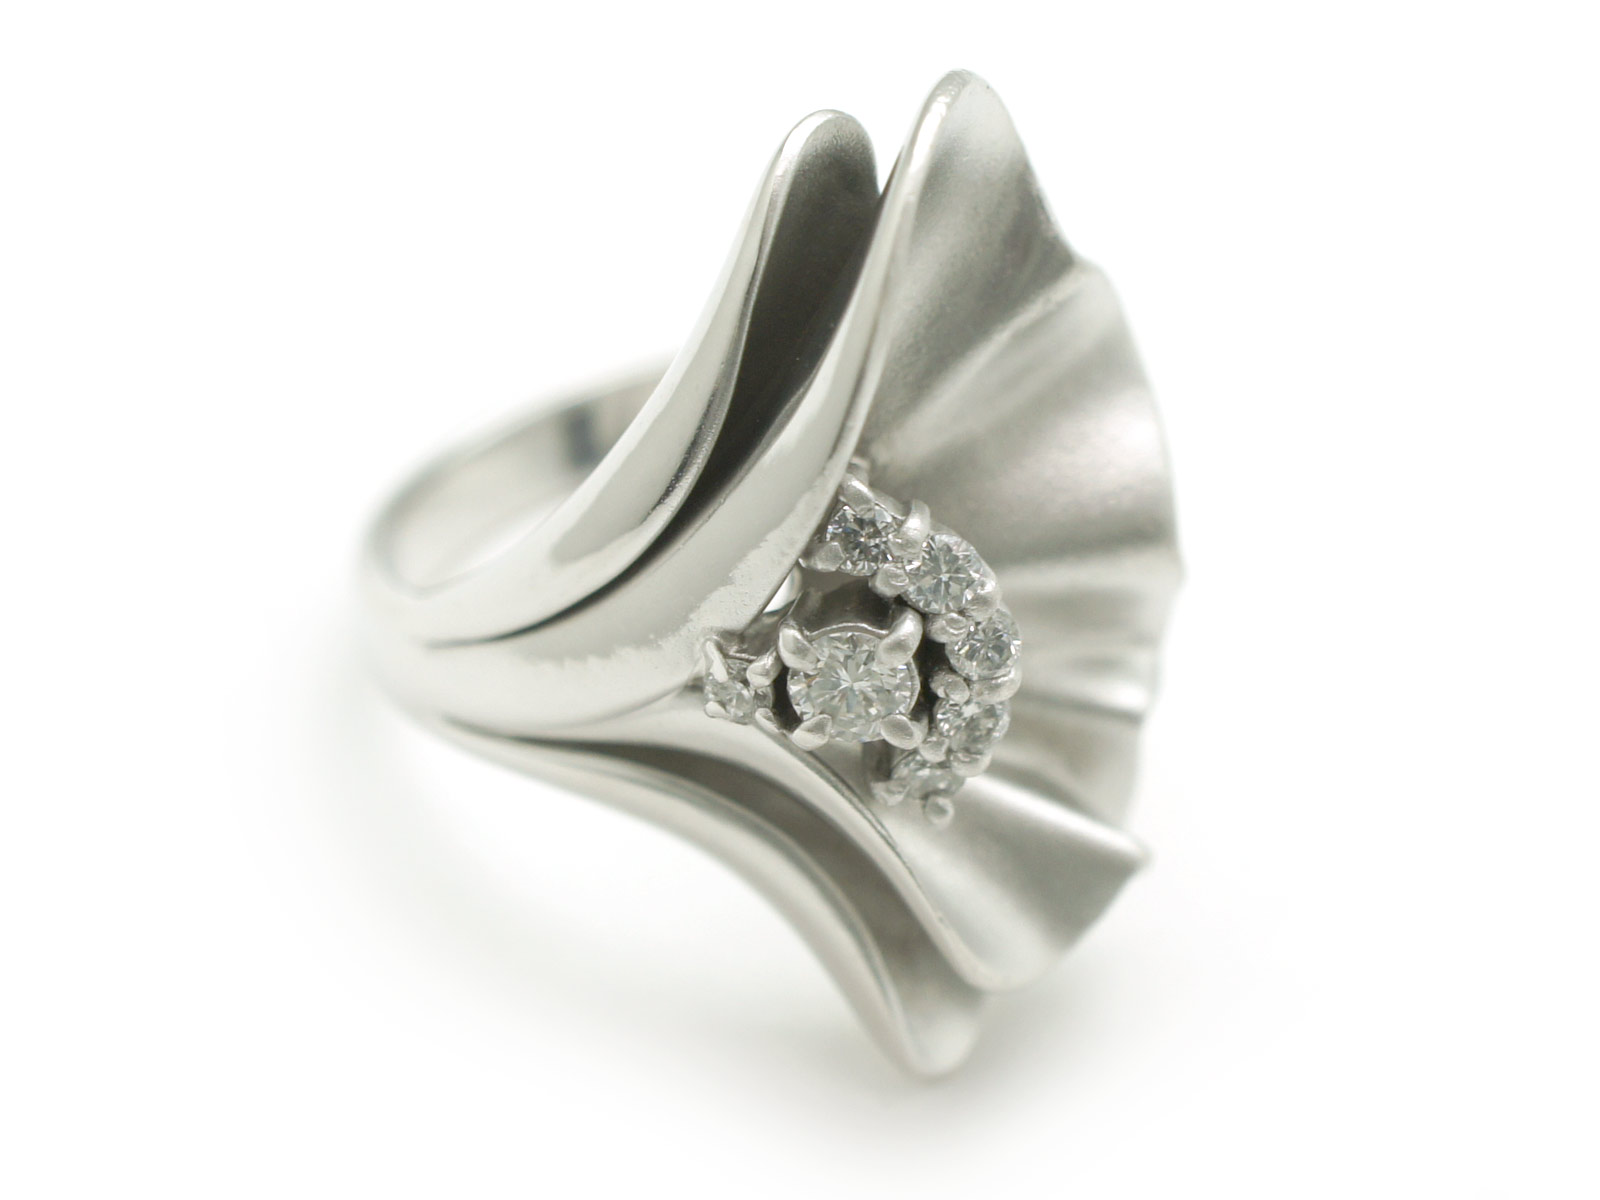 Pt900×D0.07/0.12ct リング 約12.5号 指輪 プラチナ×ダイヤモンド 花びら フラワー 大きめ アクセサリー ジュエリー 宝石 レディース【】 USED_A n16-818 かんてい局北名古屋店 プラチナ&ダイヤモンドが輝く♪ダイナミックなデザインが存在感抜群です♪